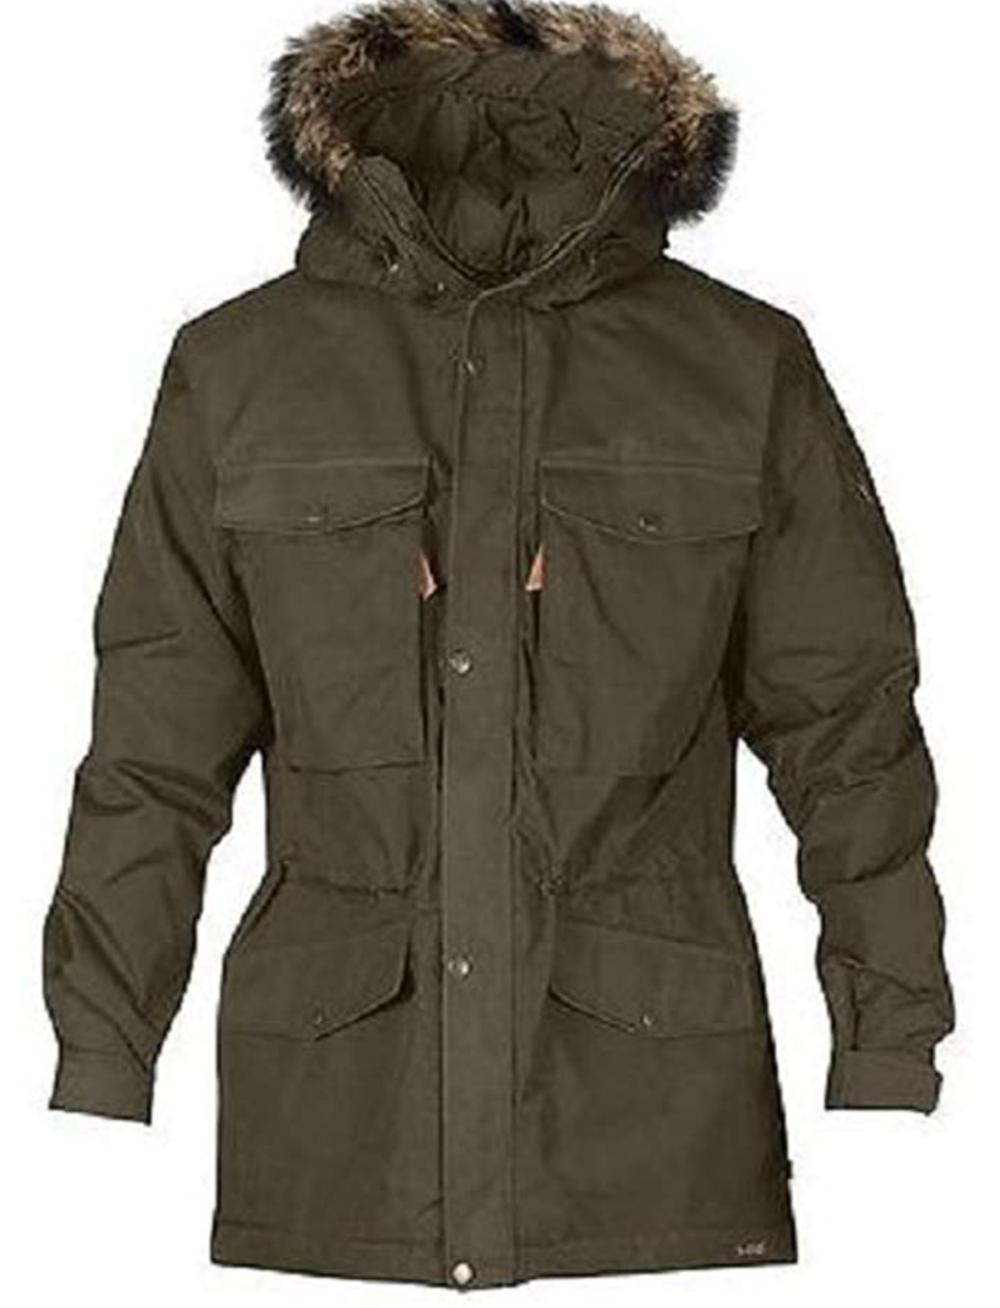 Fjallraven Men's Sarek Winter Jacket